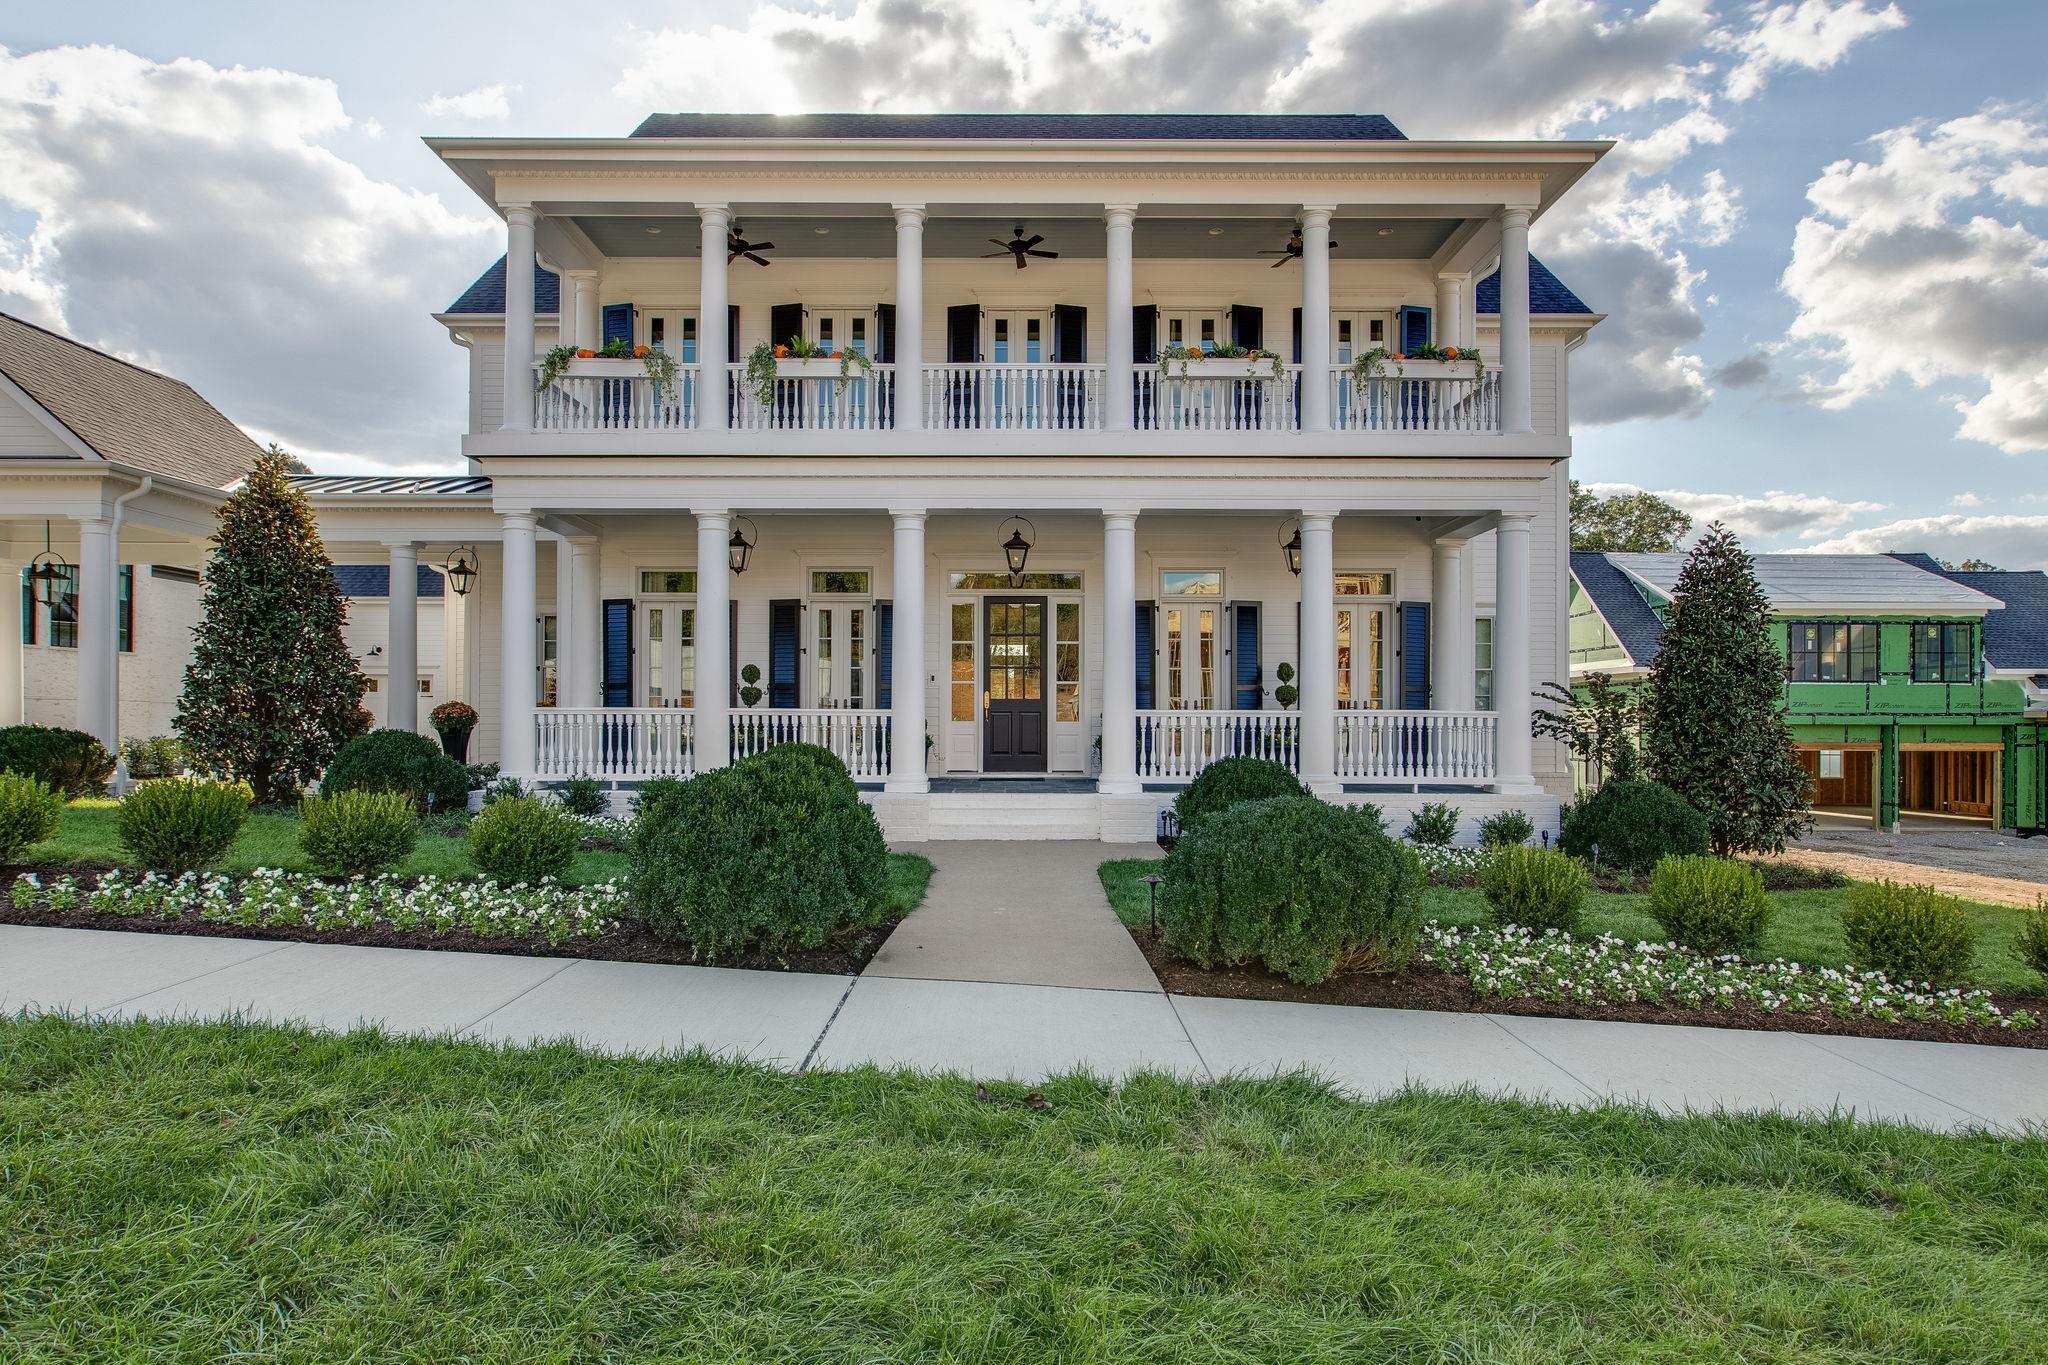 8150 Heirloom Blvd (Lot 11035), College Grove, TN 37046 - College Grove, TN real estate listing